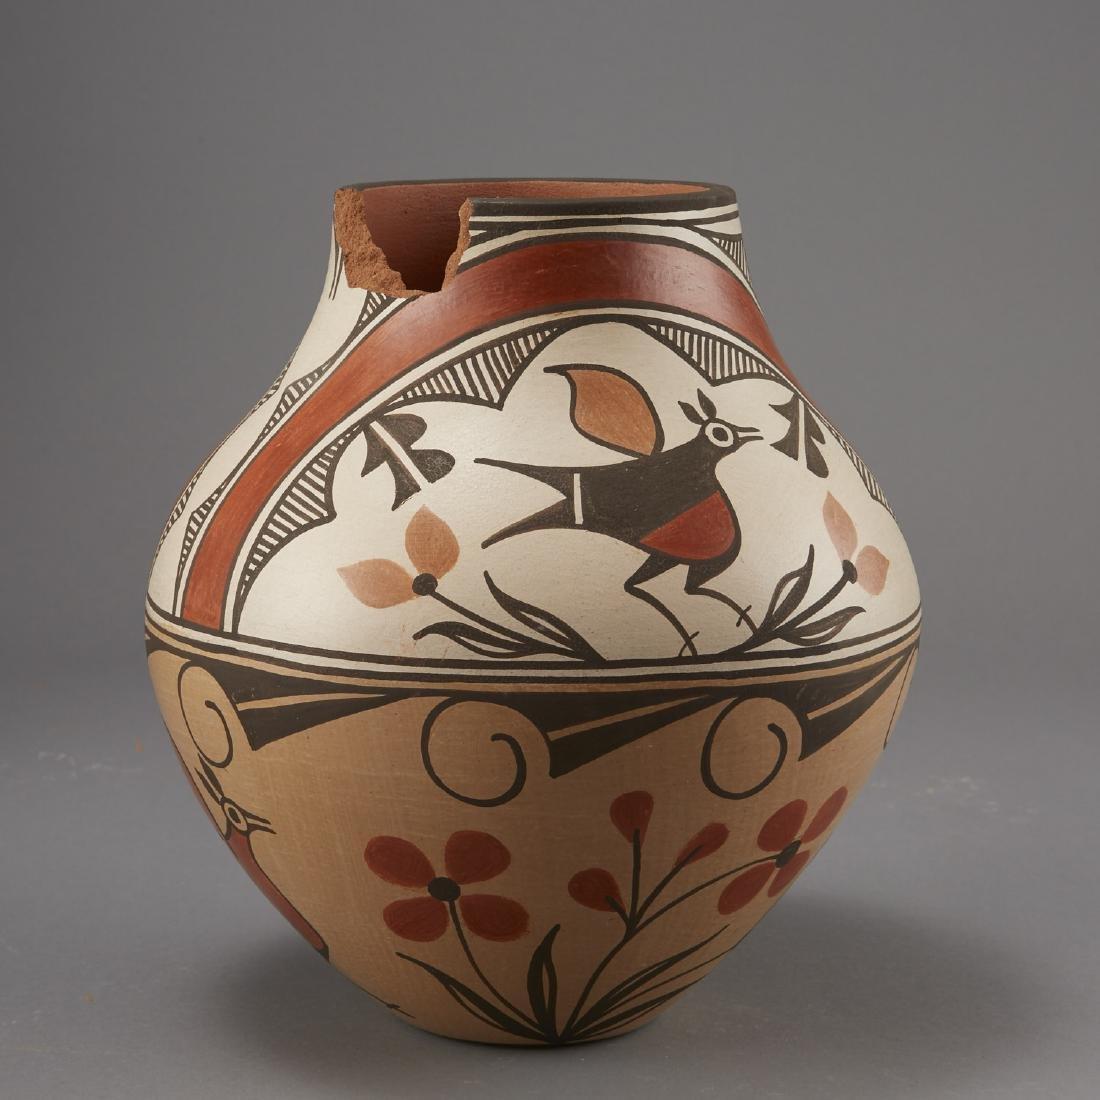 6 Pueblo Pottery Pots incld Fragua, Nez, Medina - 6